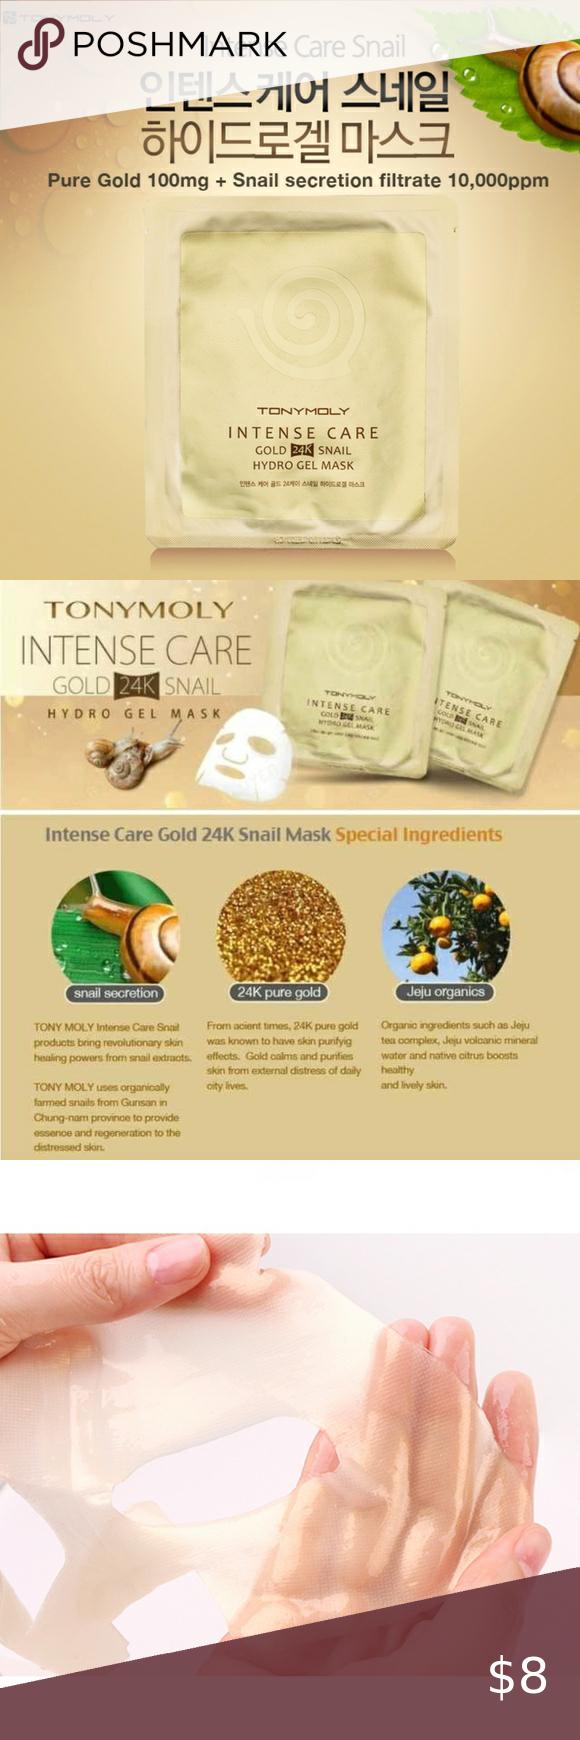 Tonymoly Intense Care Gold 24k Snail Gel Mask In 2020 Gel Mask Tony Moly Gel